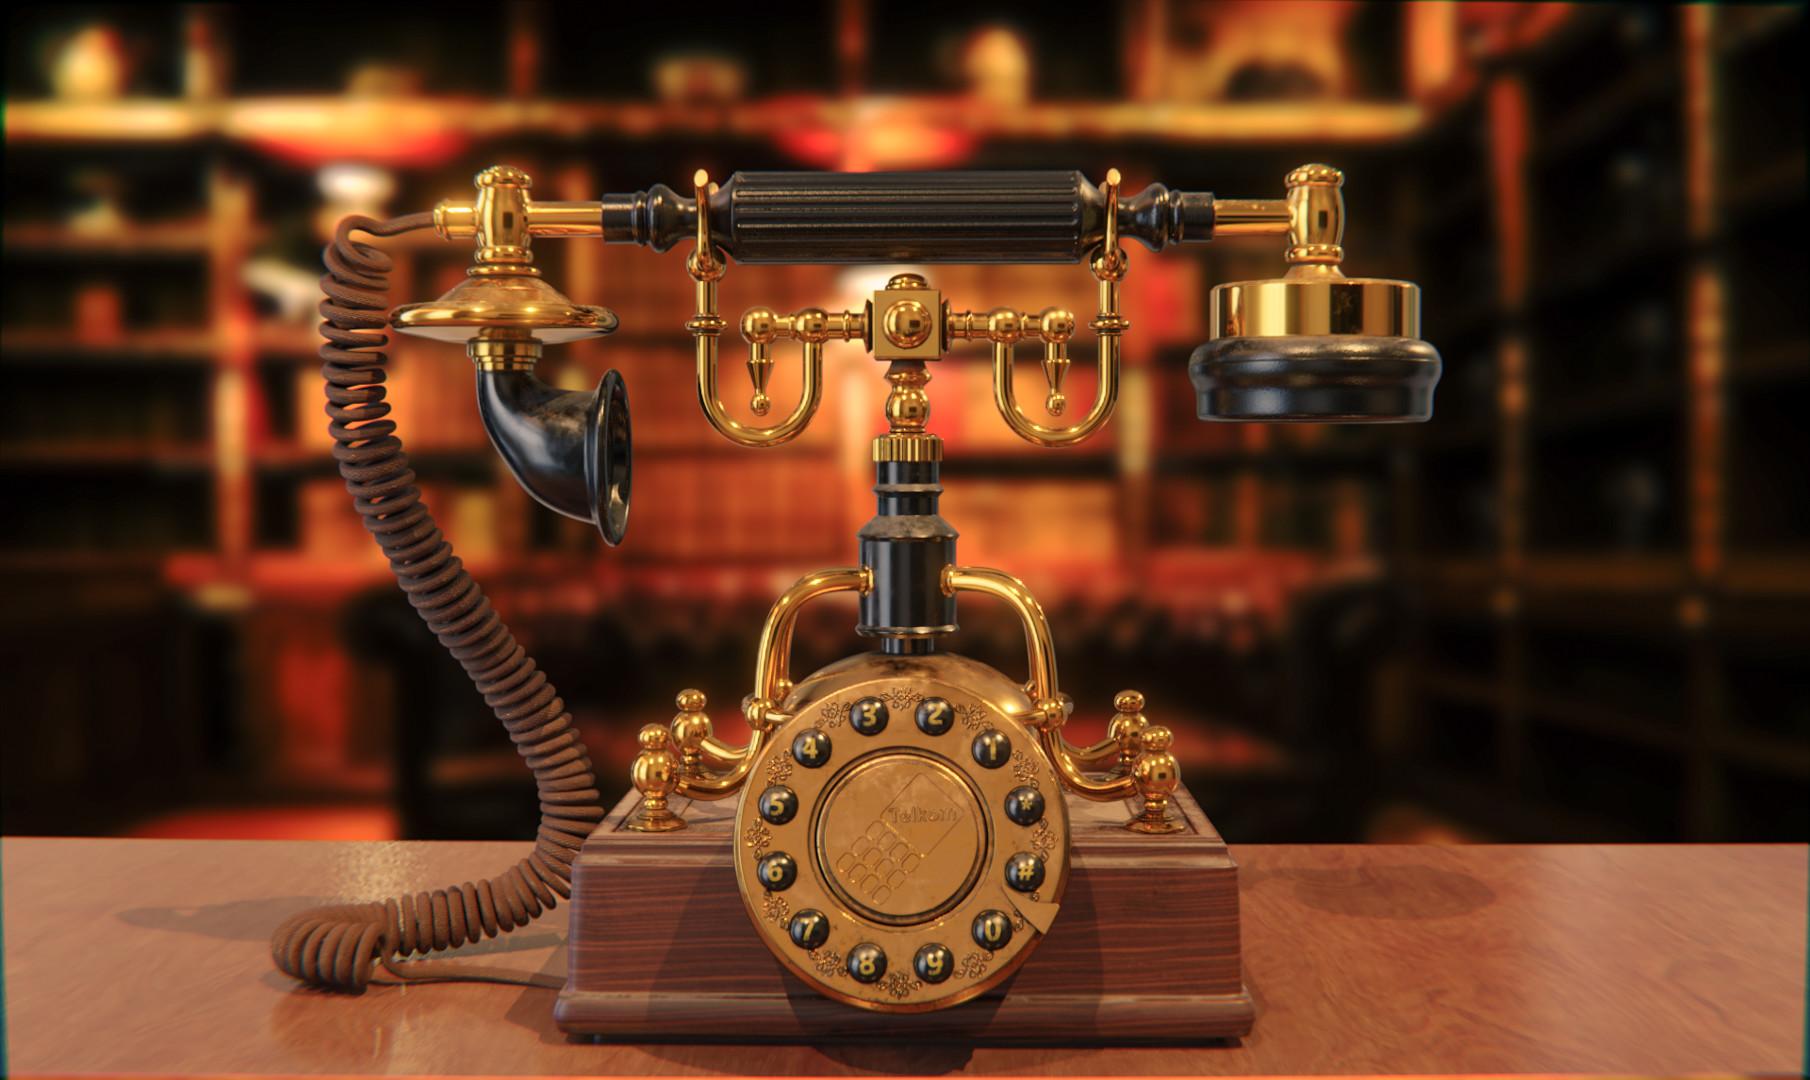 Victor duarte phone render1